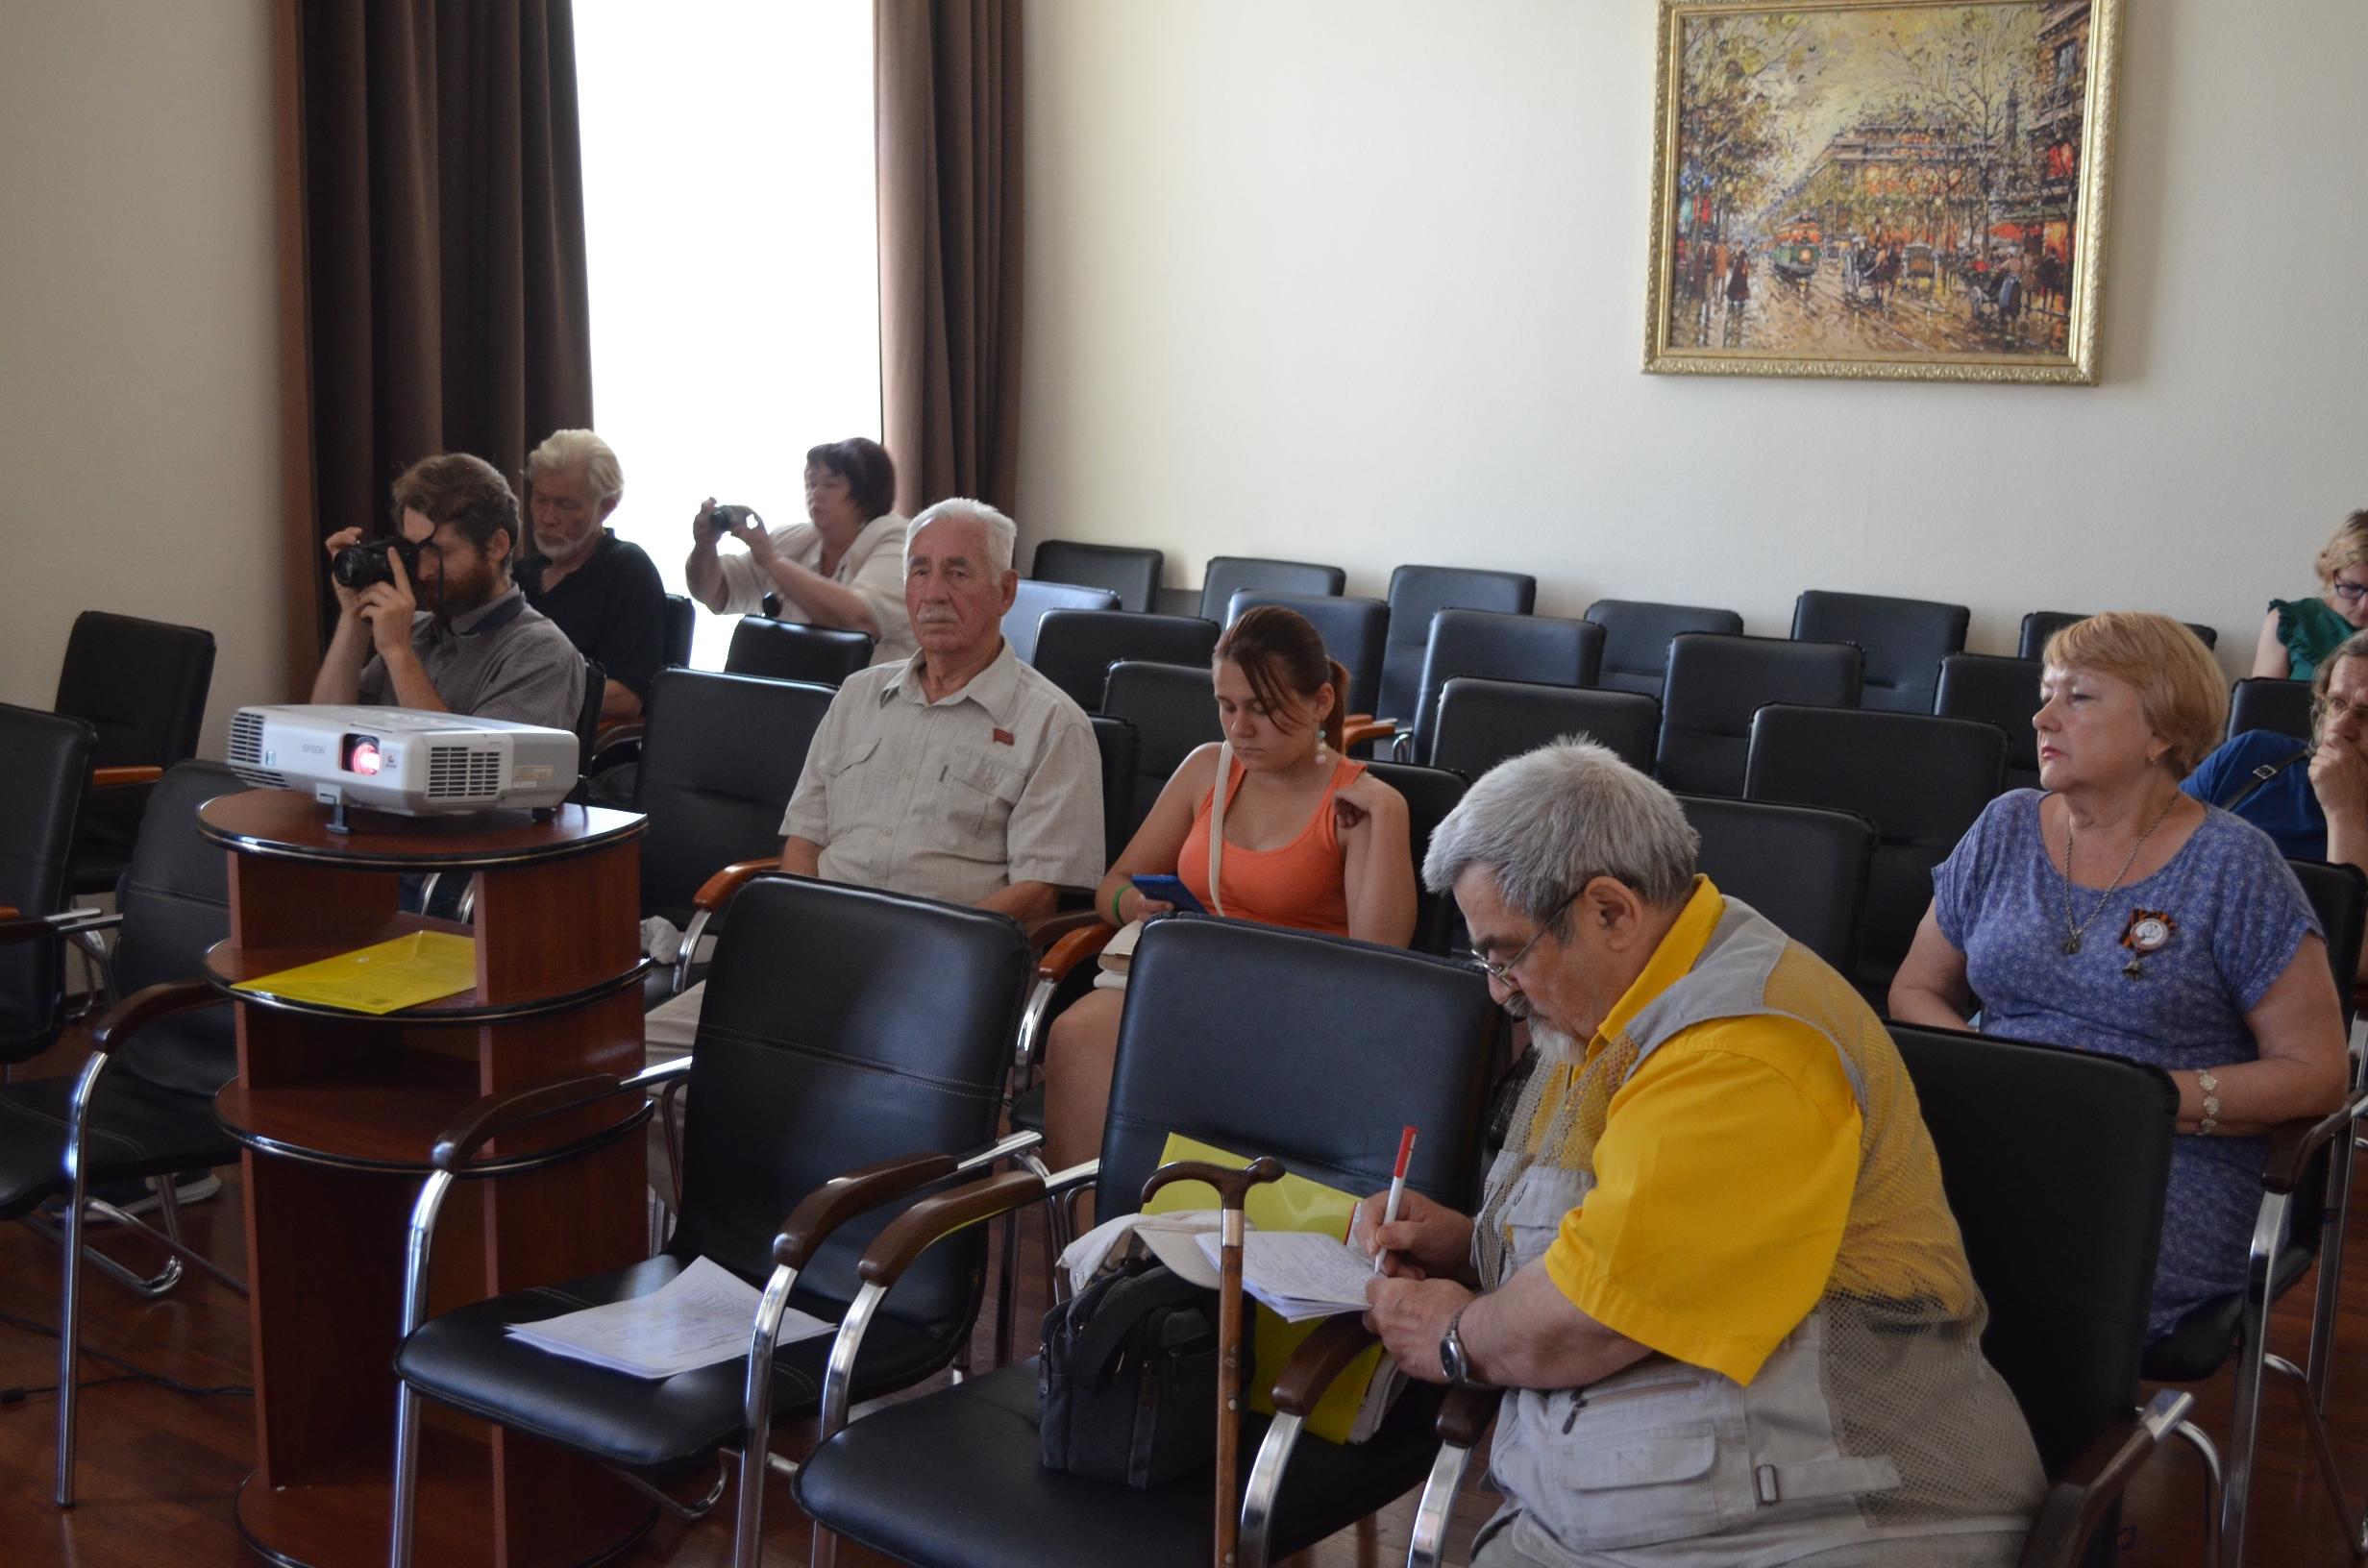 20170714-В Севастополе прошла пресс-конференция «Лики примирения»-pic3